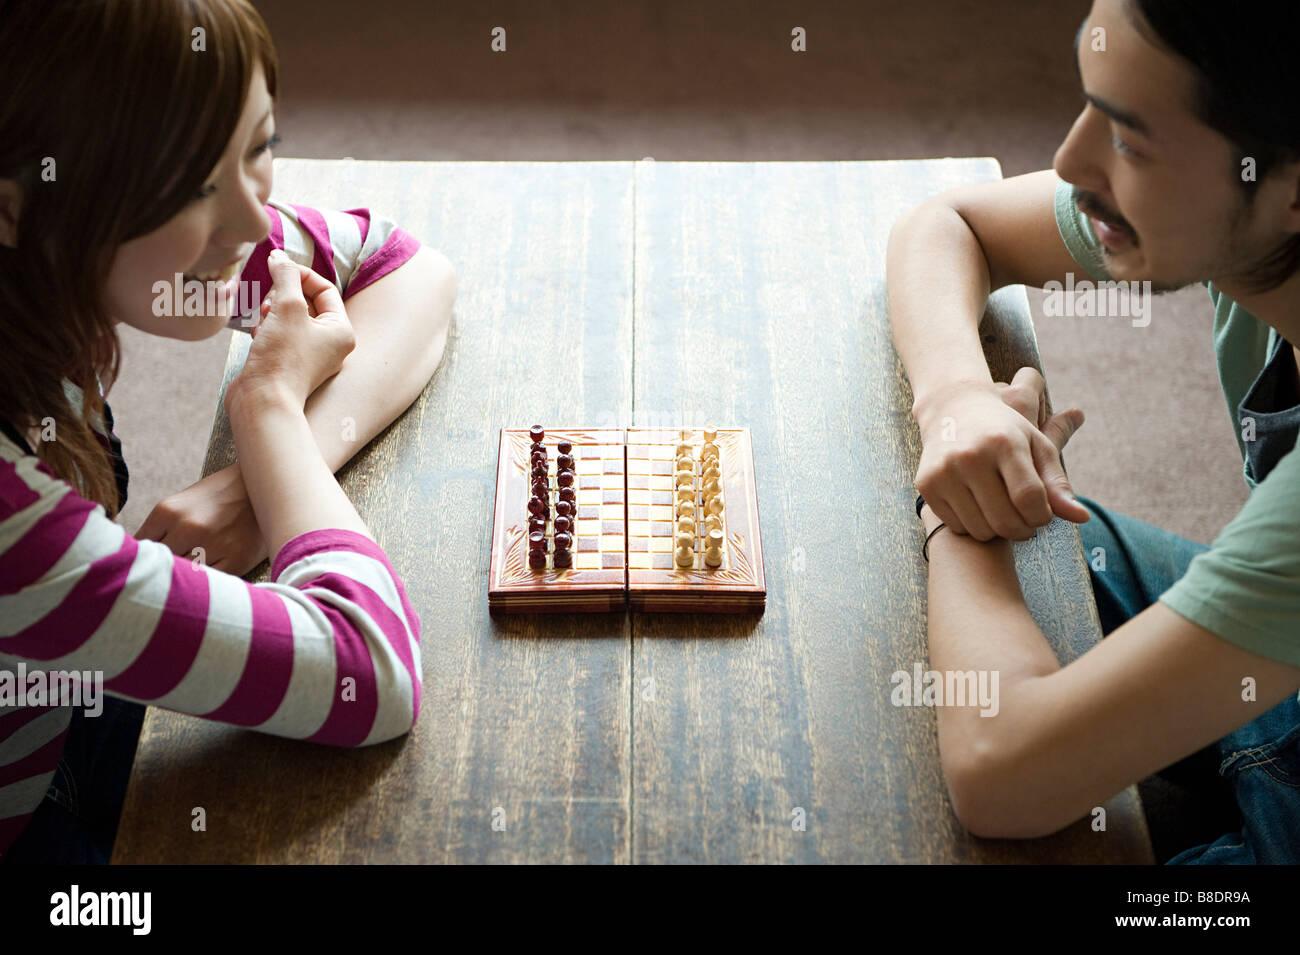 Pareja joven jugando ajedrez Imagen De Stock